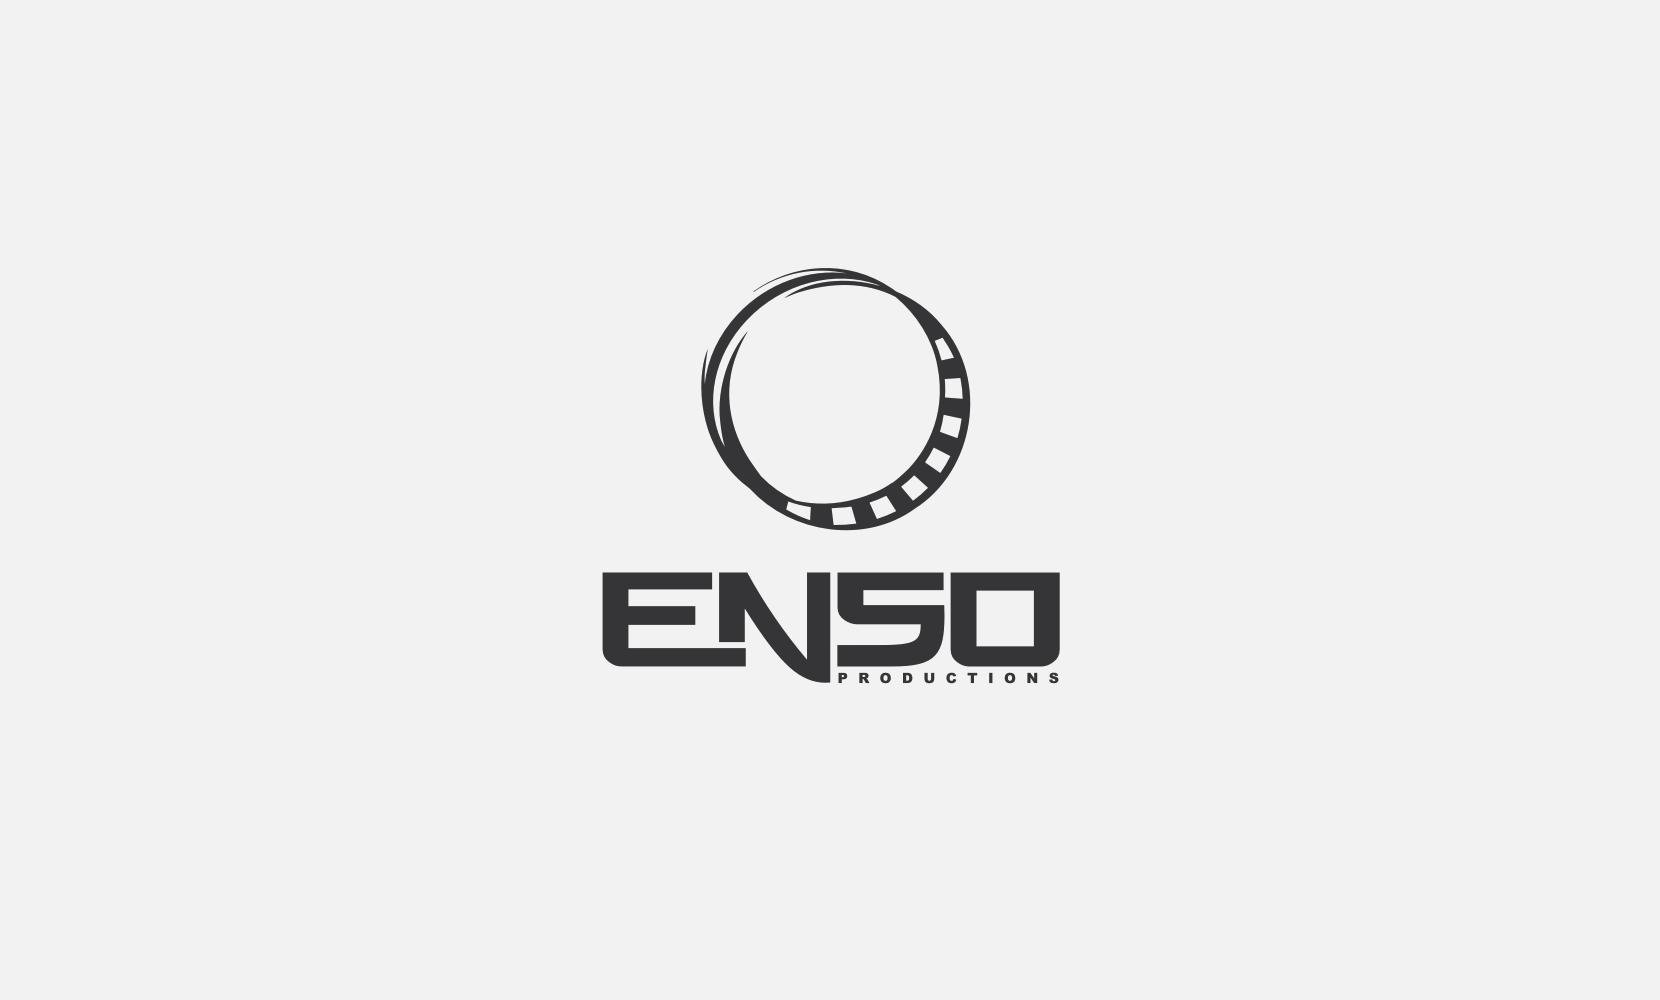 enso_logo_bg.png